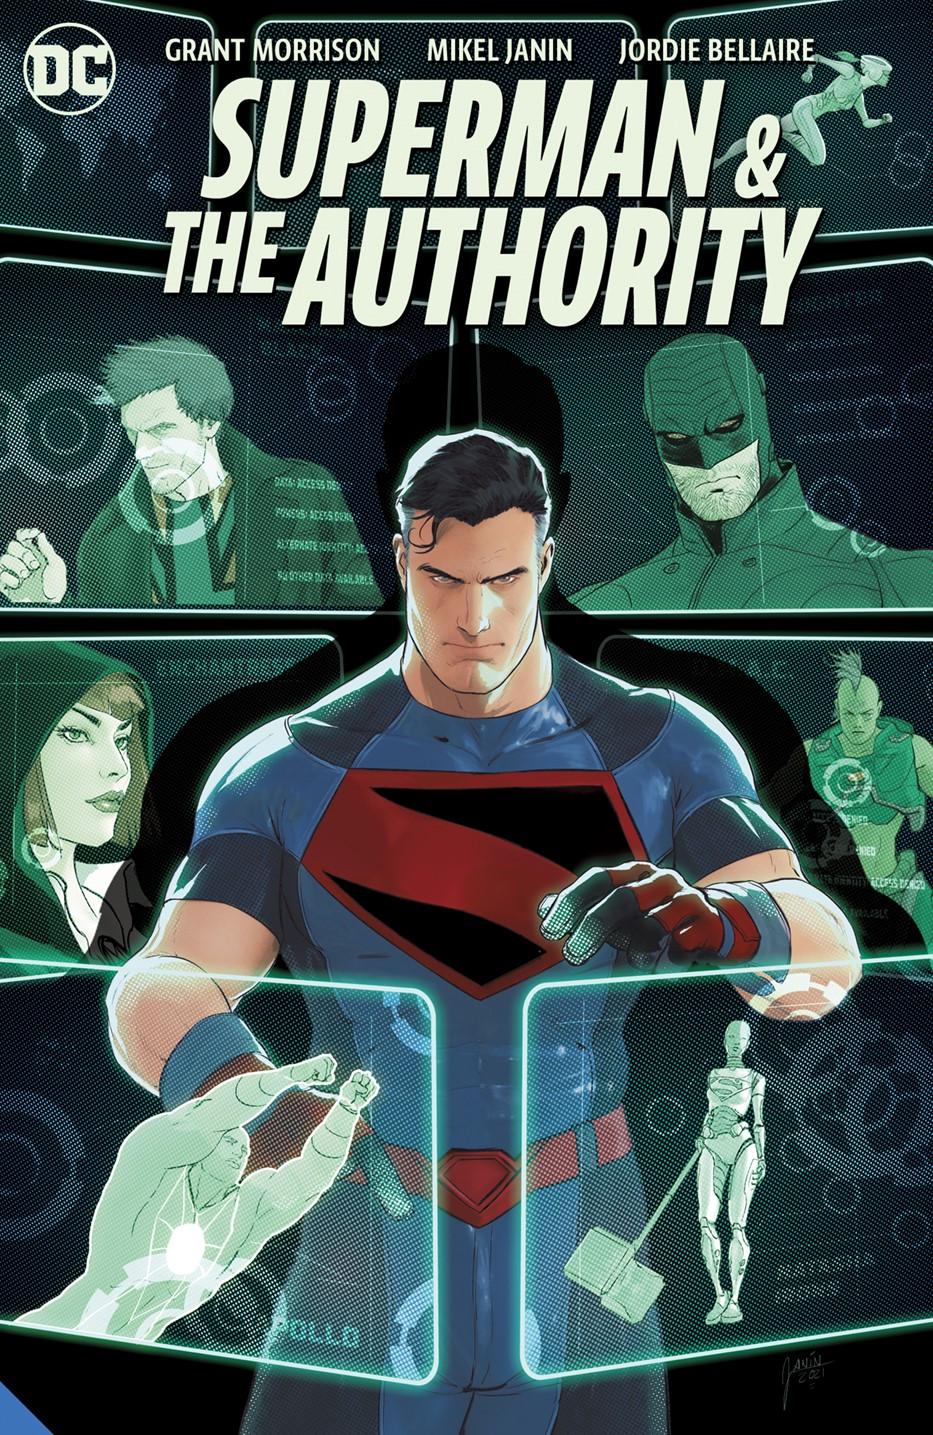 supermanandtheauthority_adv DC Comics October 2021 Solicitations